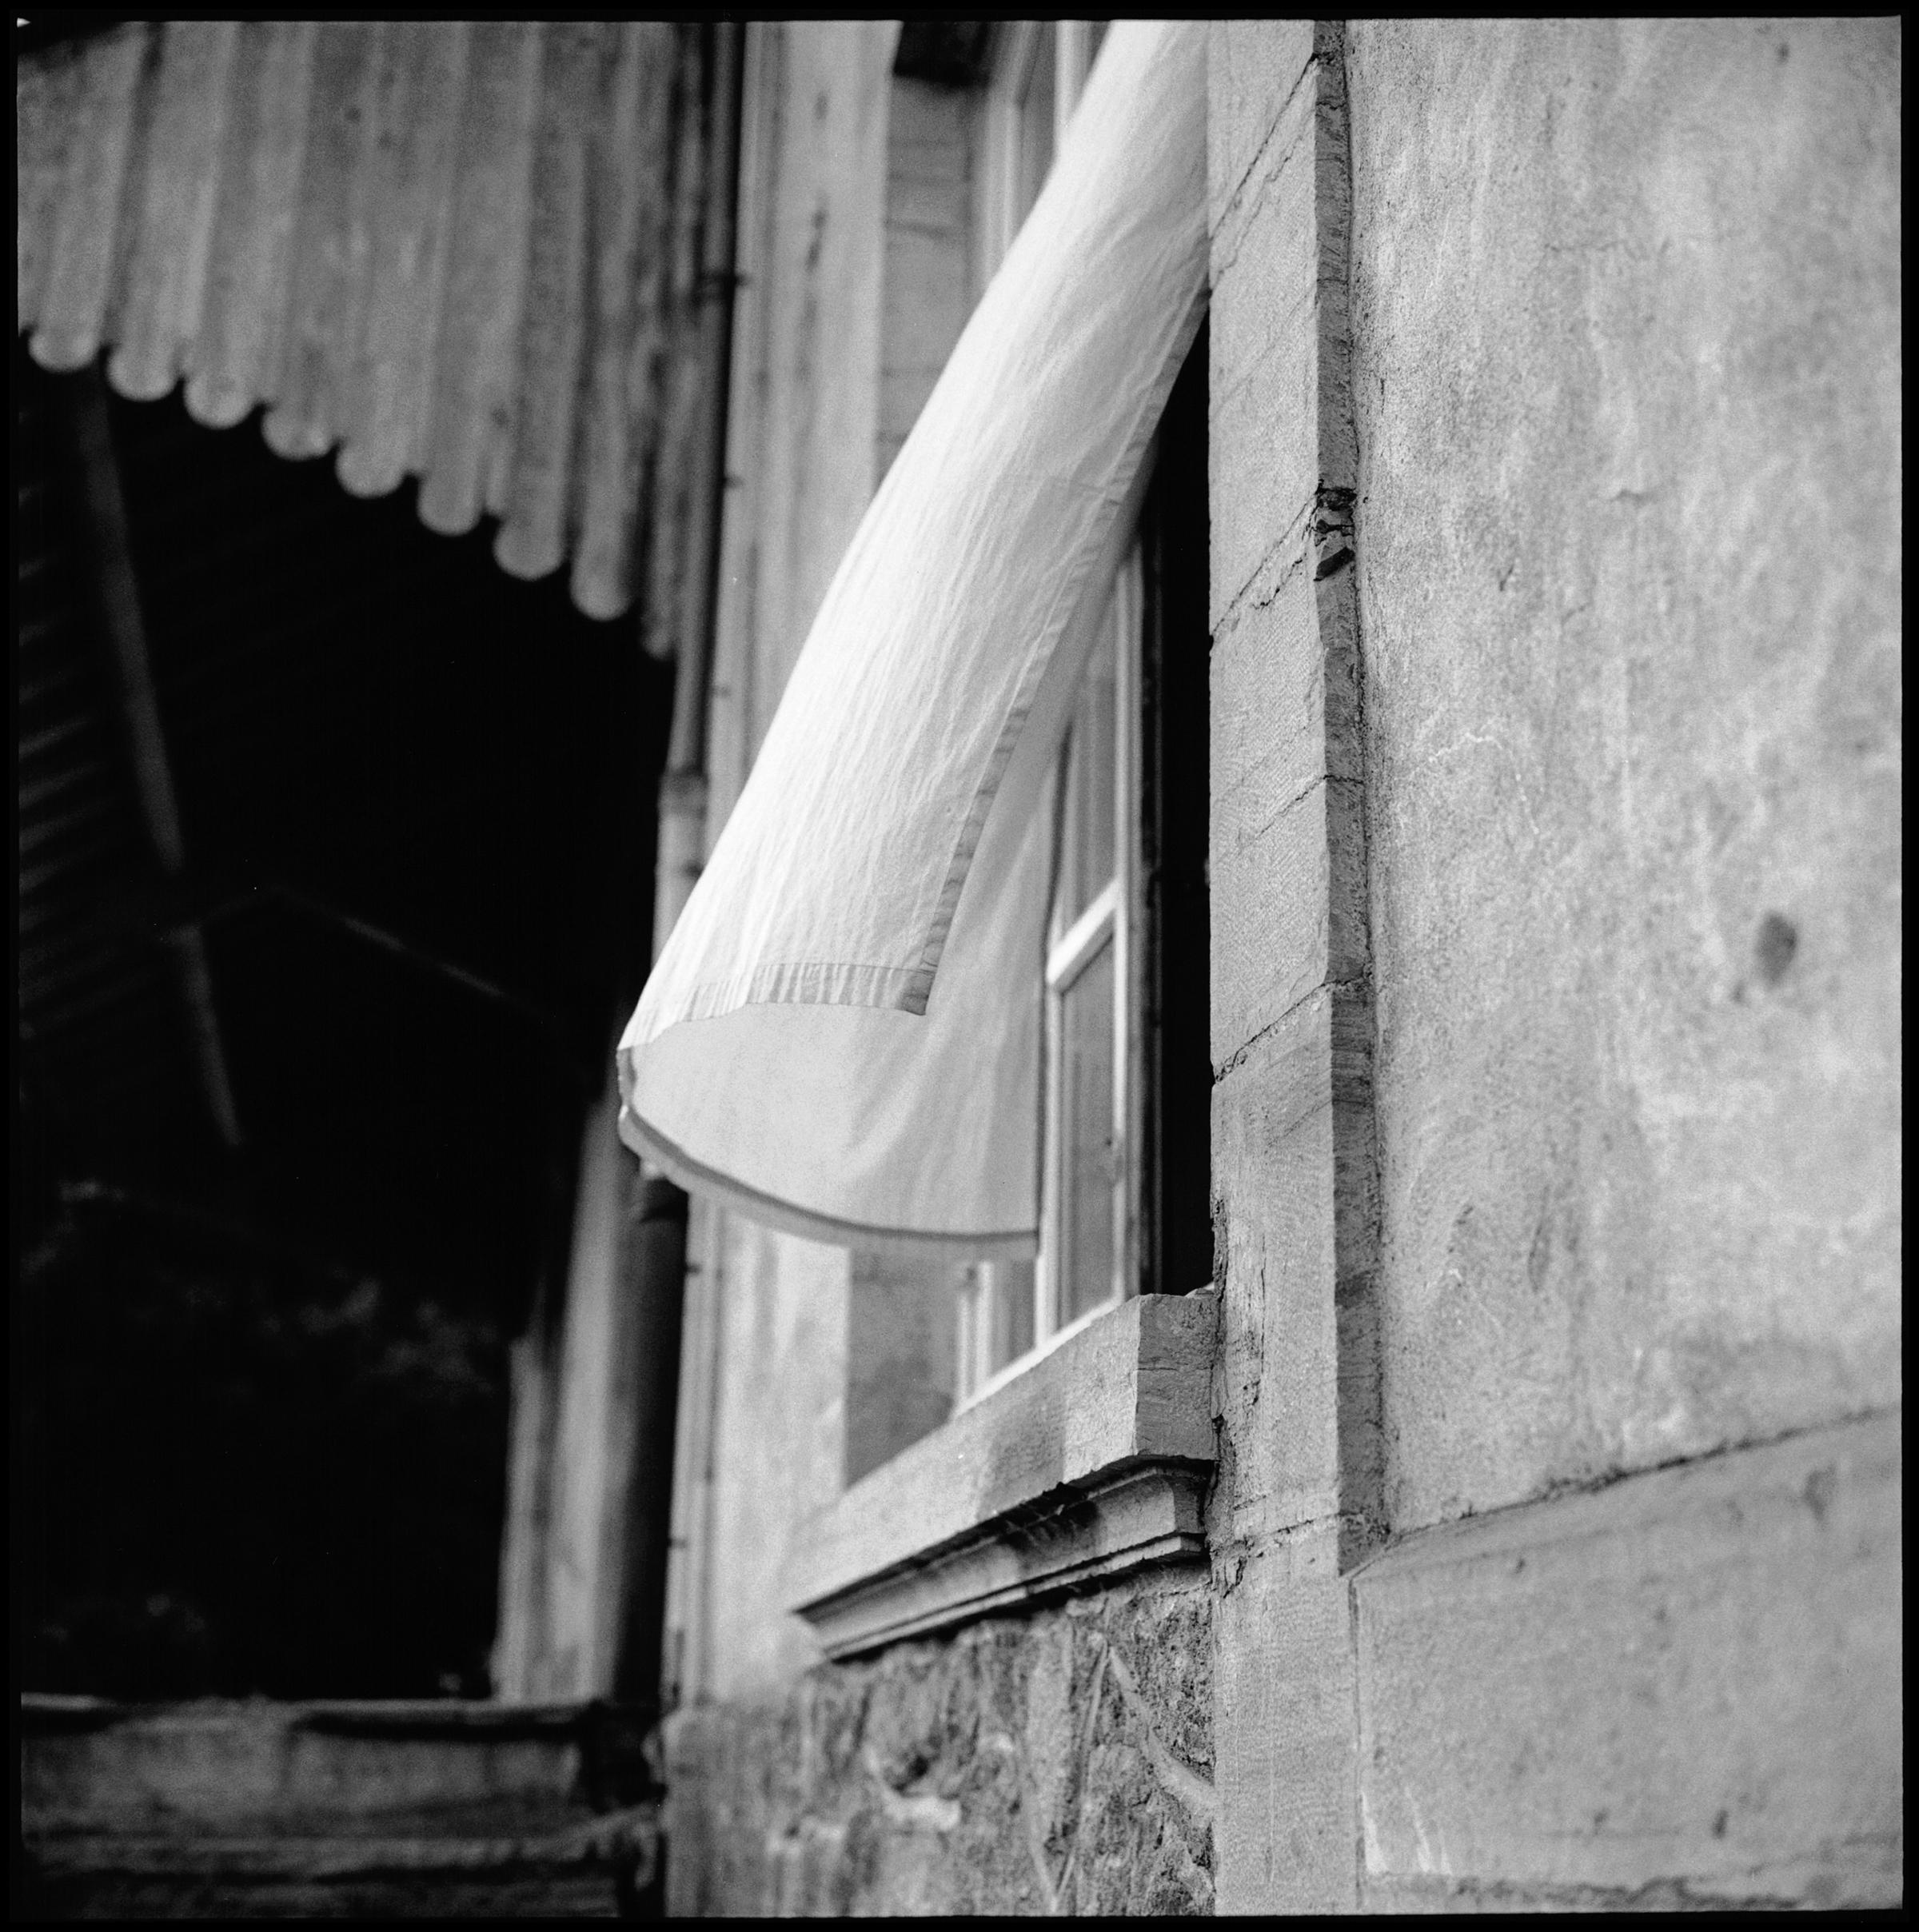 Barry_Calm_180712-01-09-SS-RP-Window with curtain at Cafe de la Gare Aumessas_2018-07-10 copy.jpg